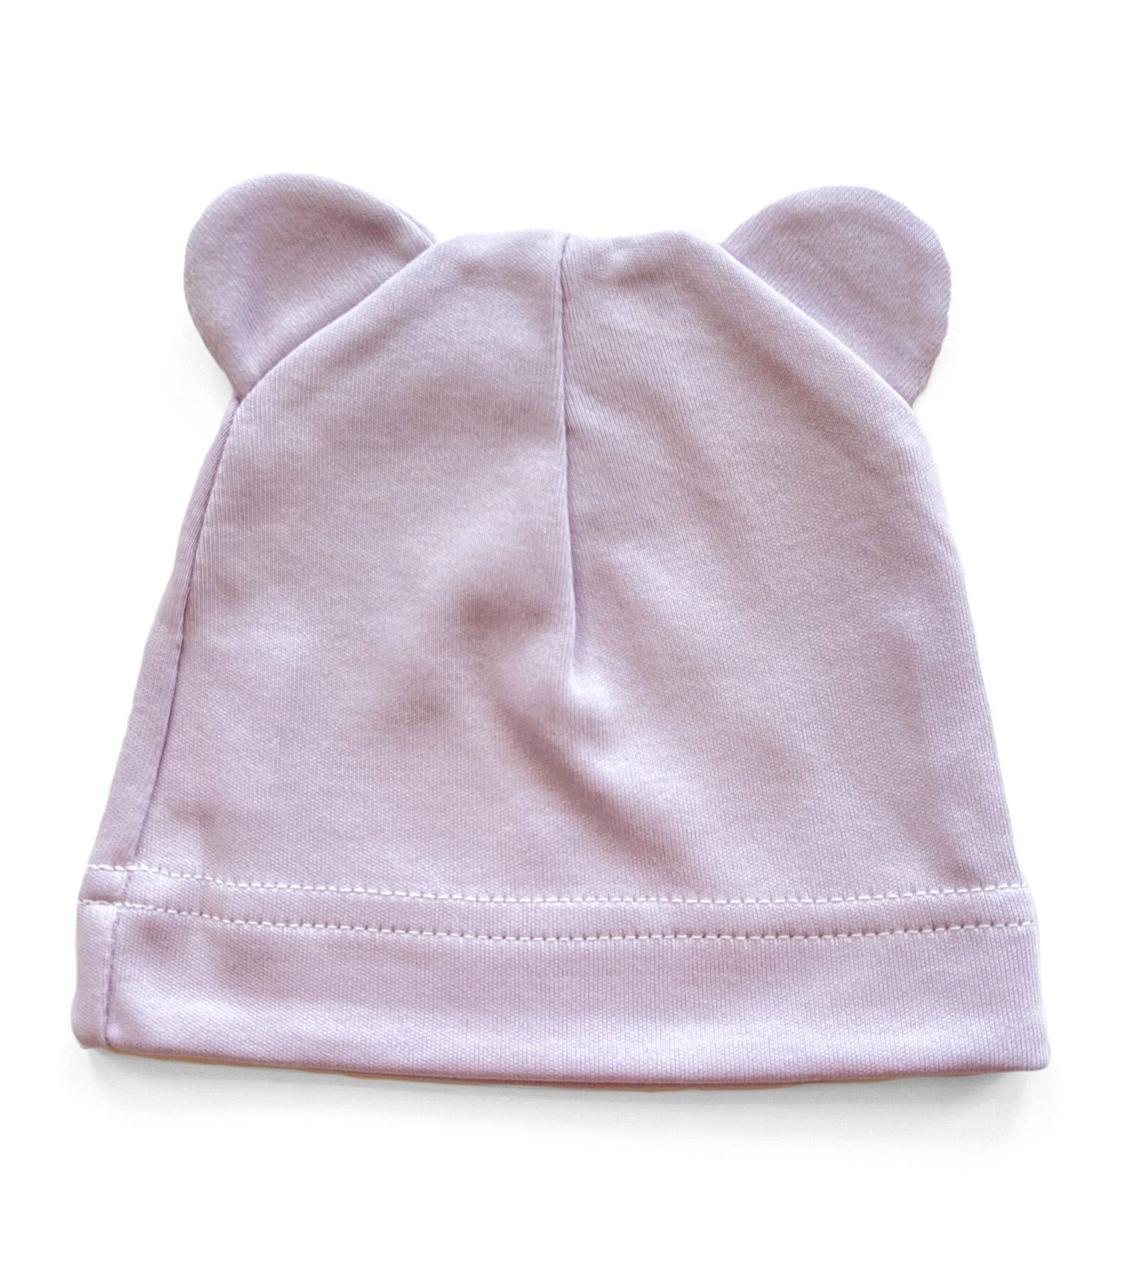 Шапочка Baby Body 0-6 мес Лавандовая с ушками №15